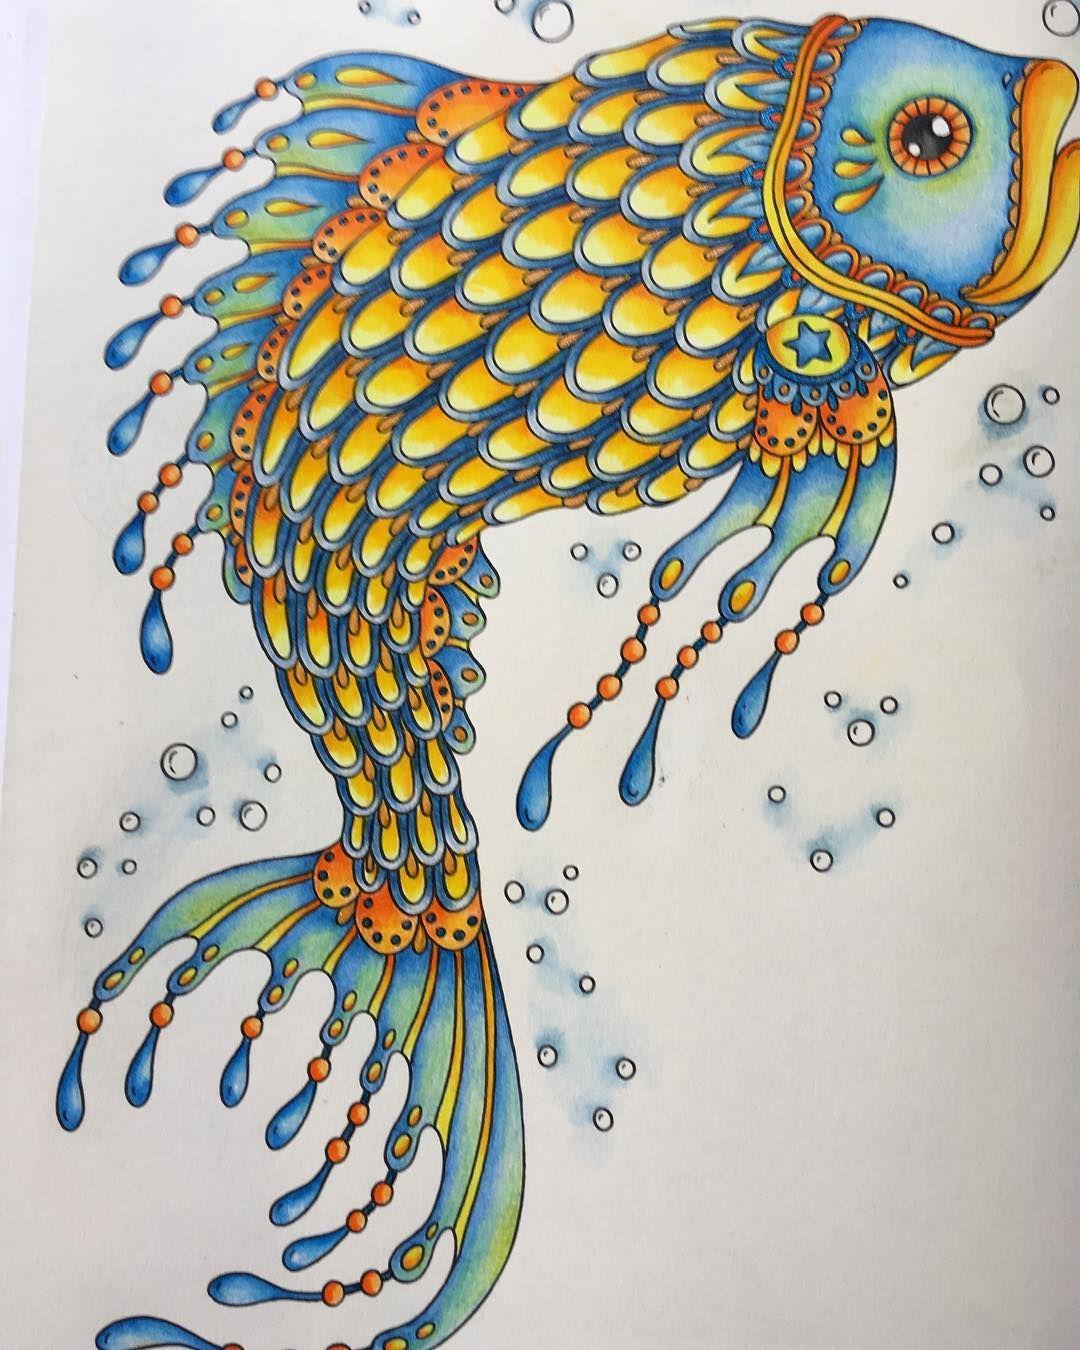 Big Fish Hannakarlzon Magicaldawn Polychromos Colouredpencil Colour Colouringbook Colouring Colouringin Fish Drawings Color Pencil Art Coloring Books